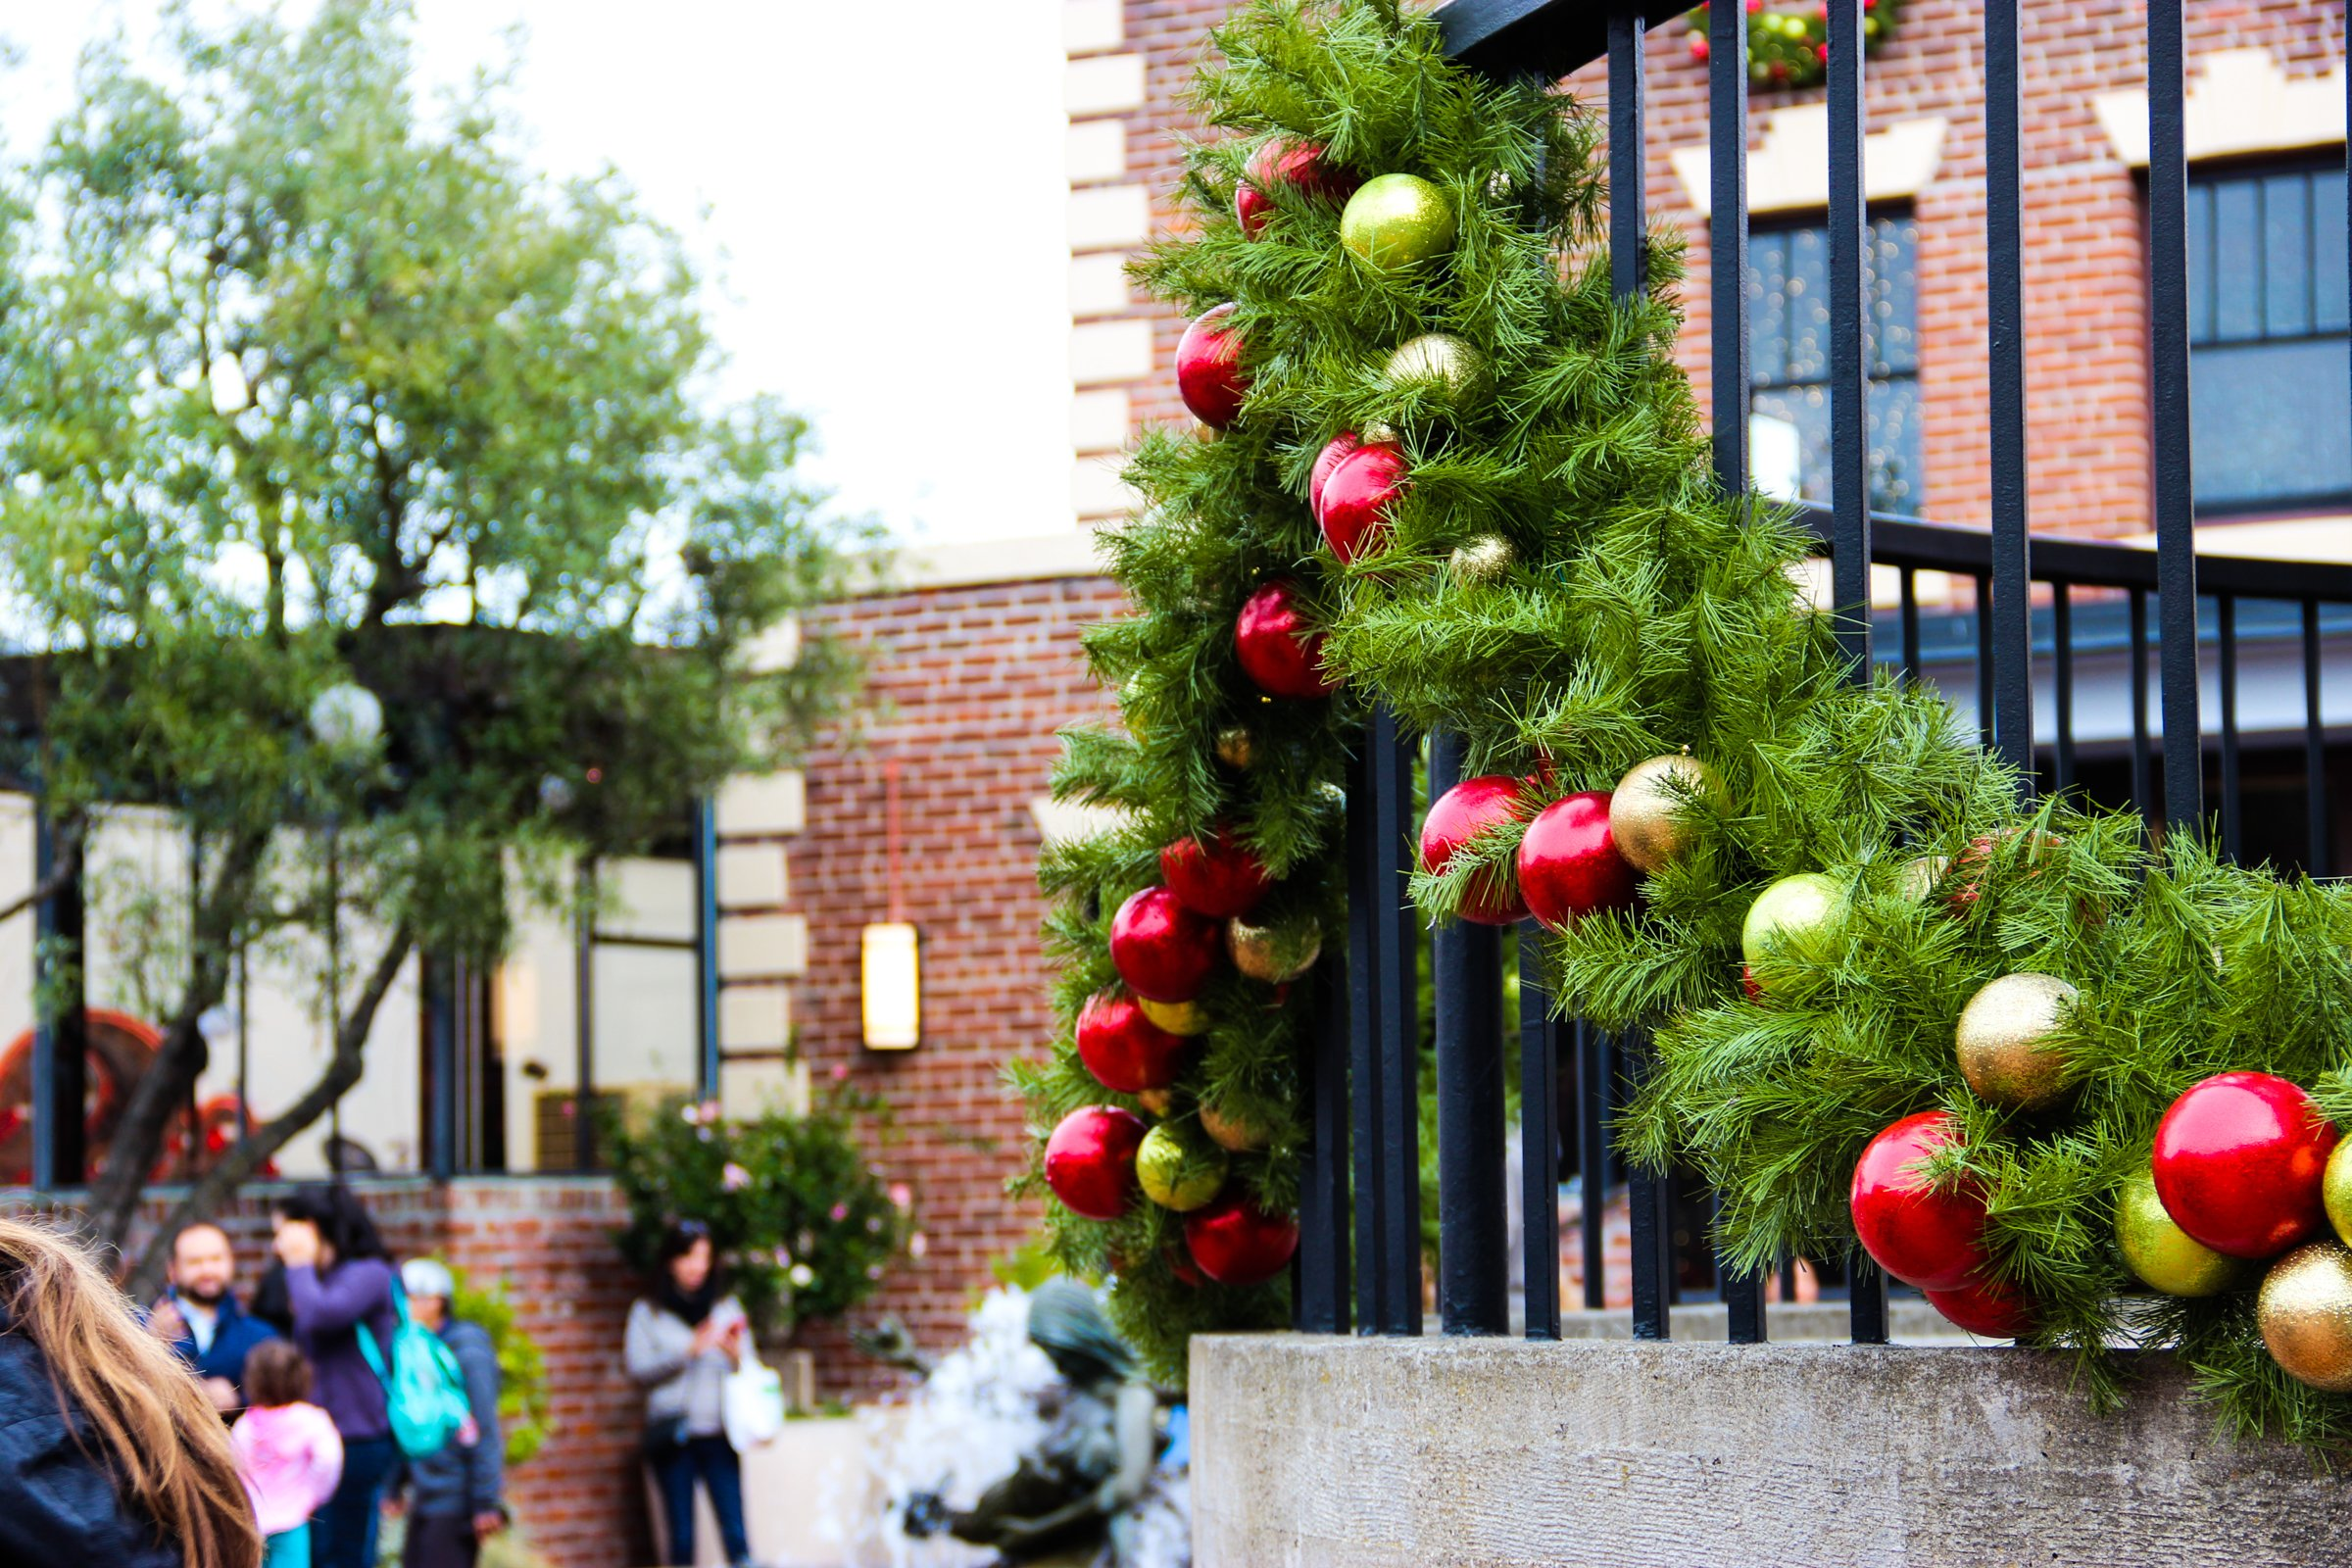 Christmas Decorations On Railings